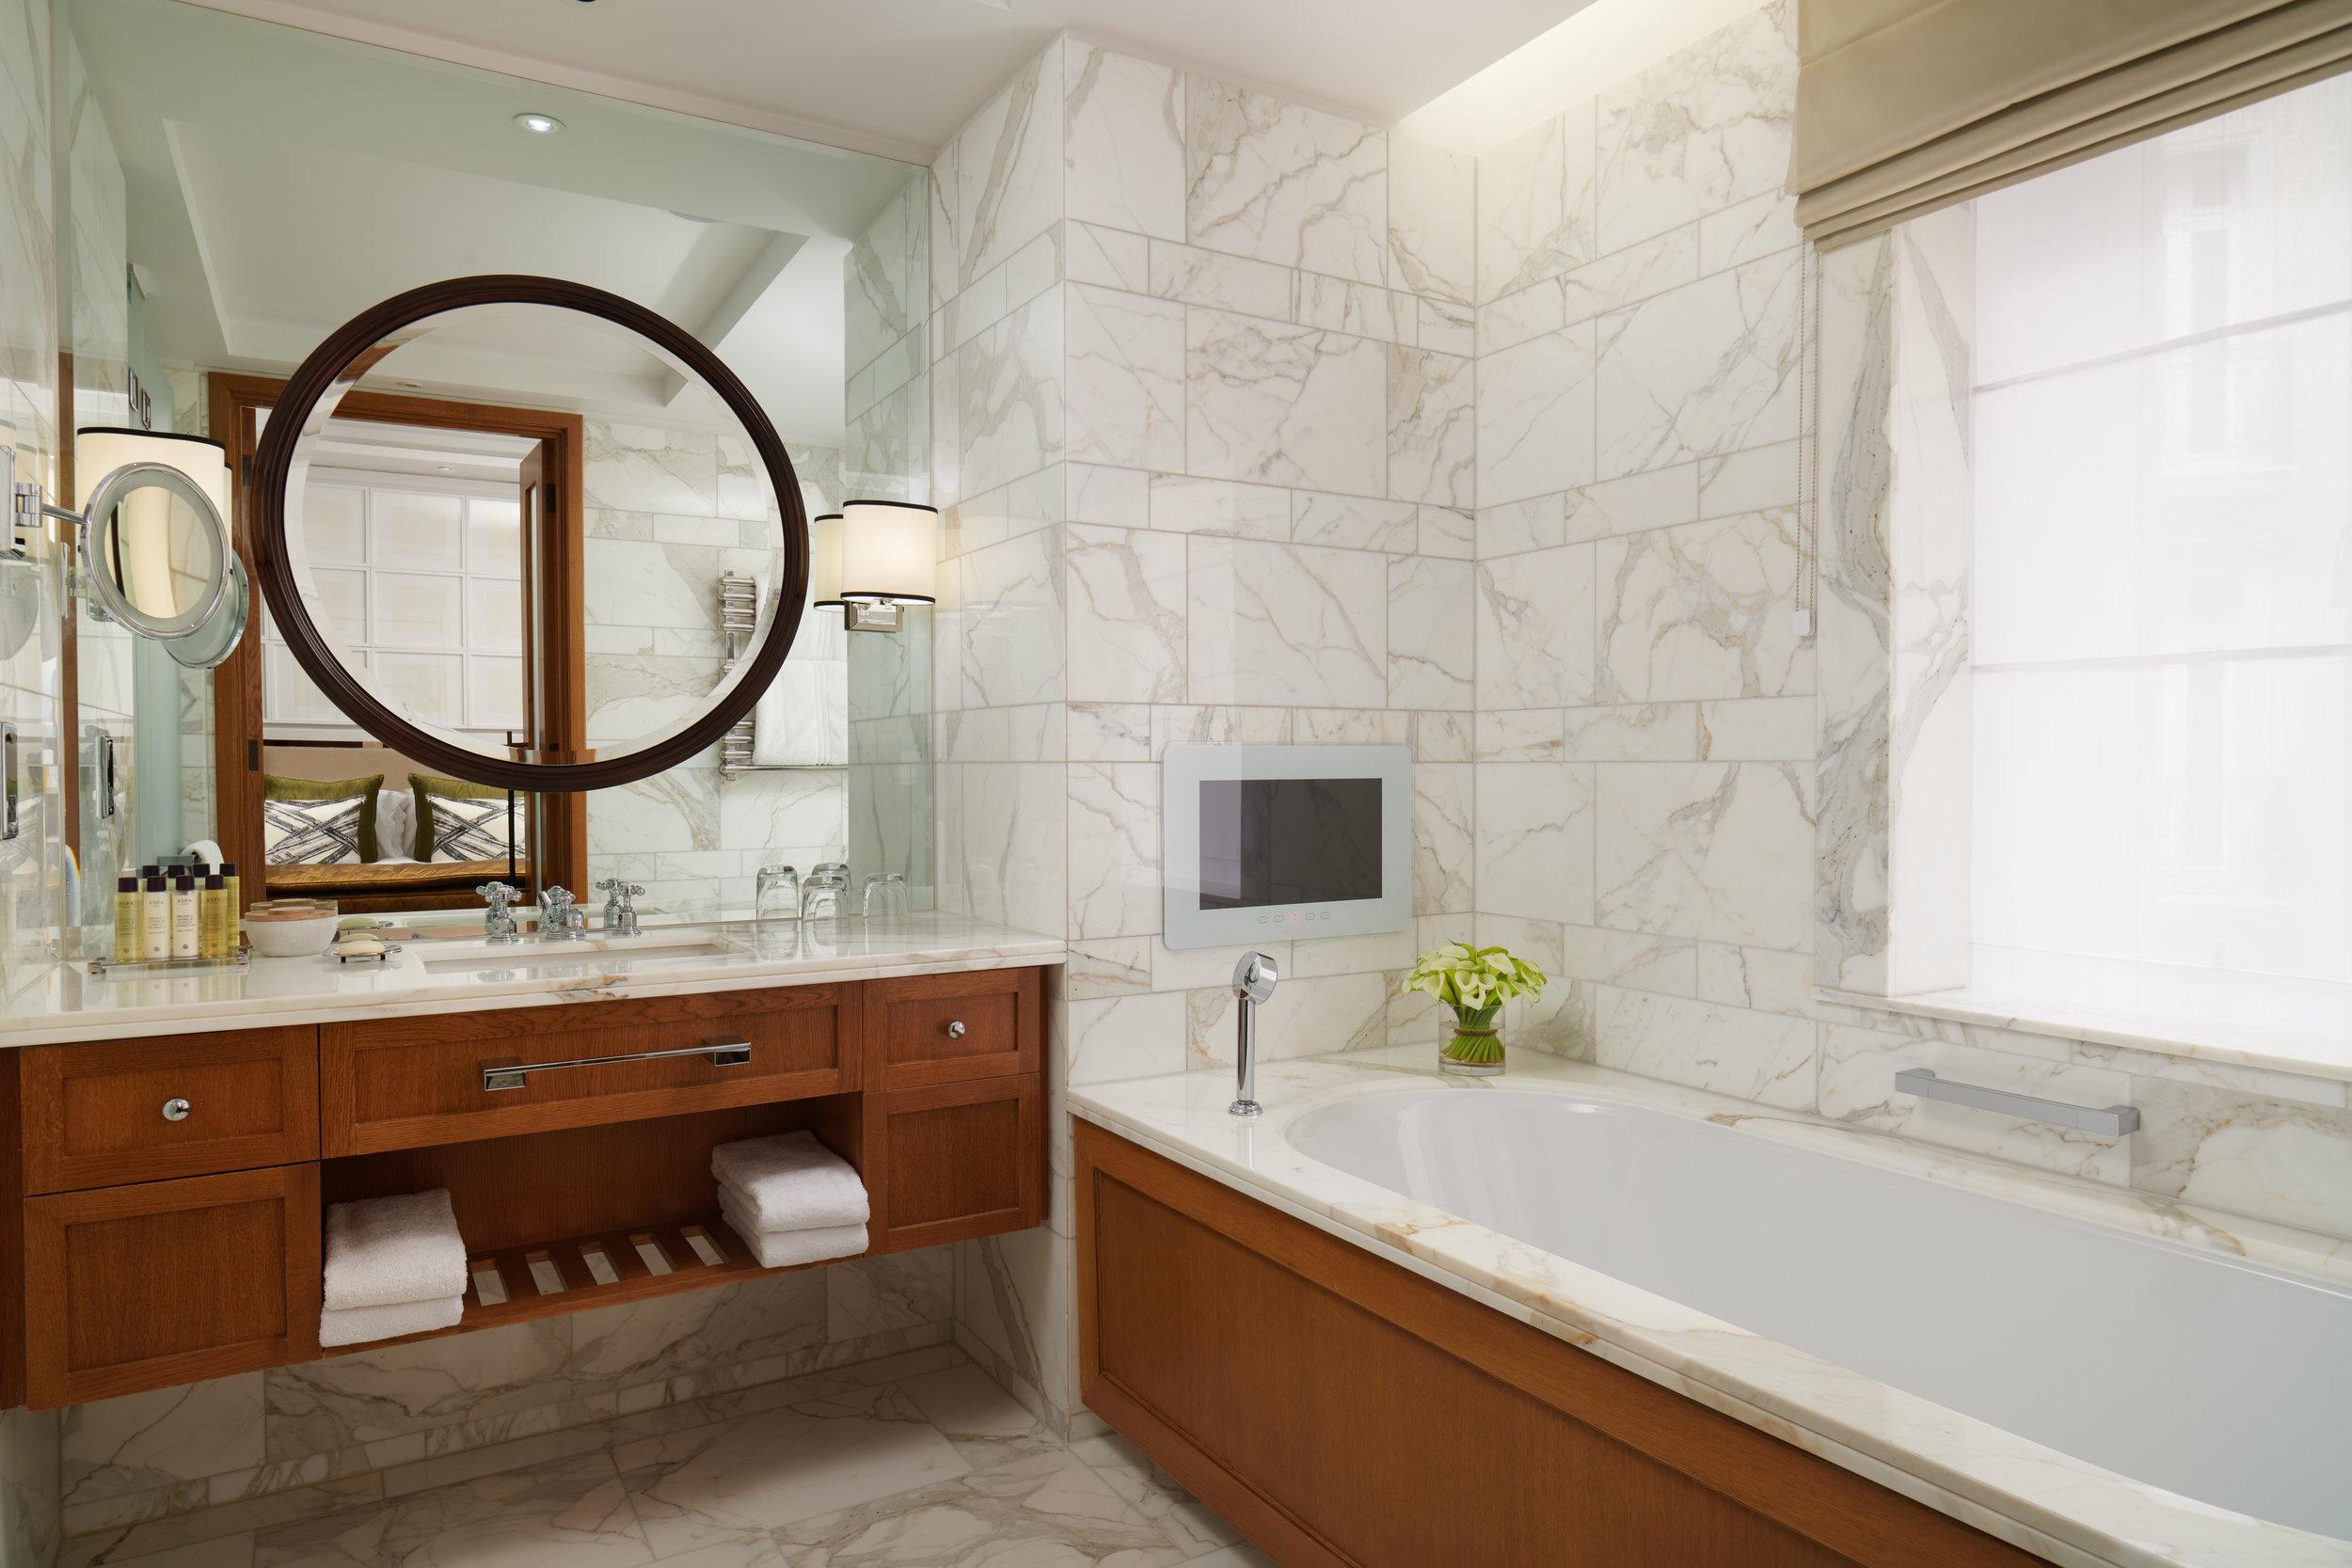 CorinthiaHotel_Garden_Suite_Bathroom_Jack_Hardy_2018.jpg